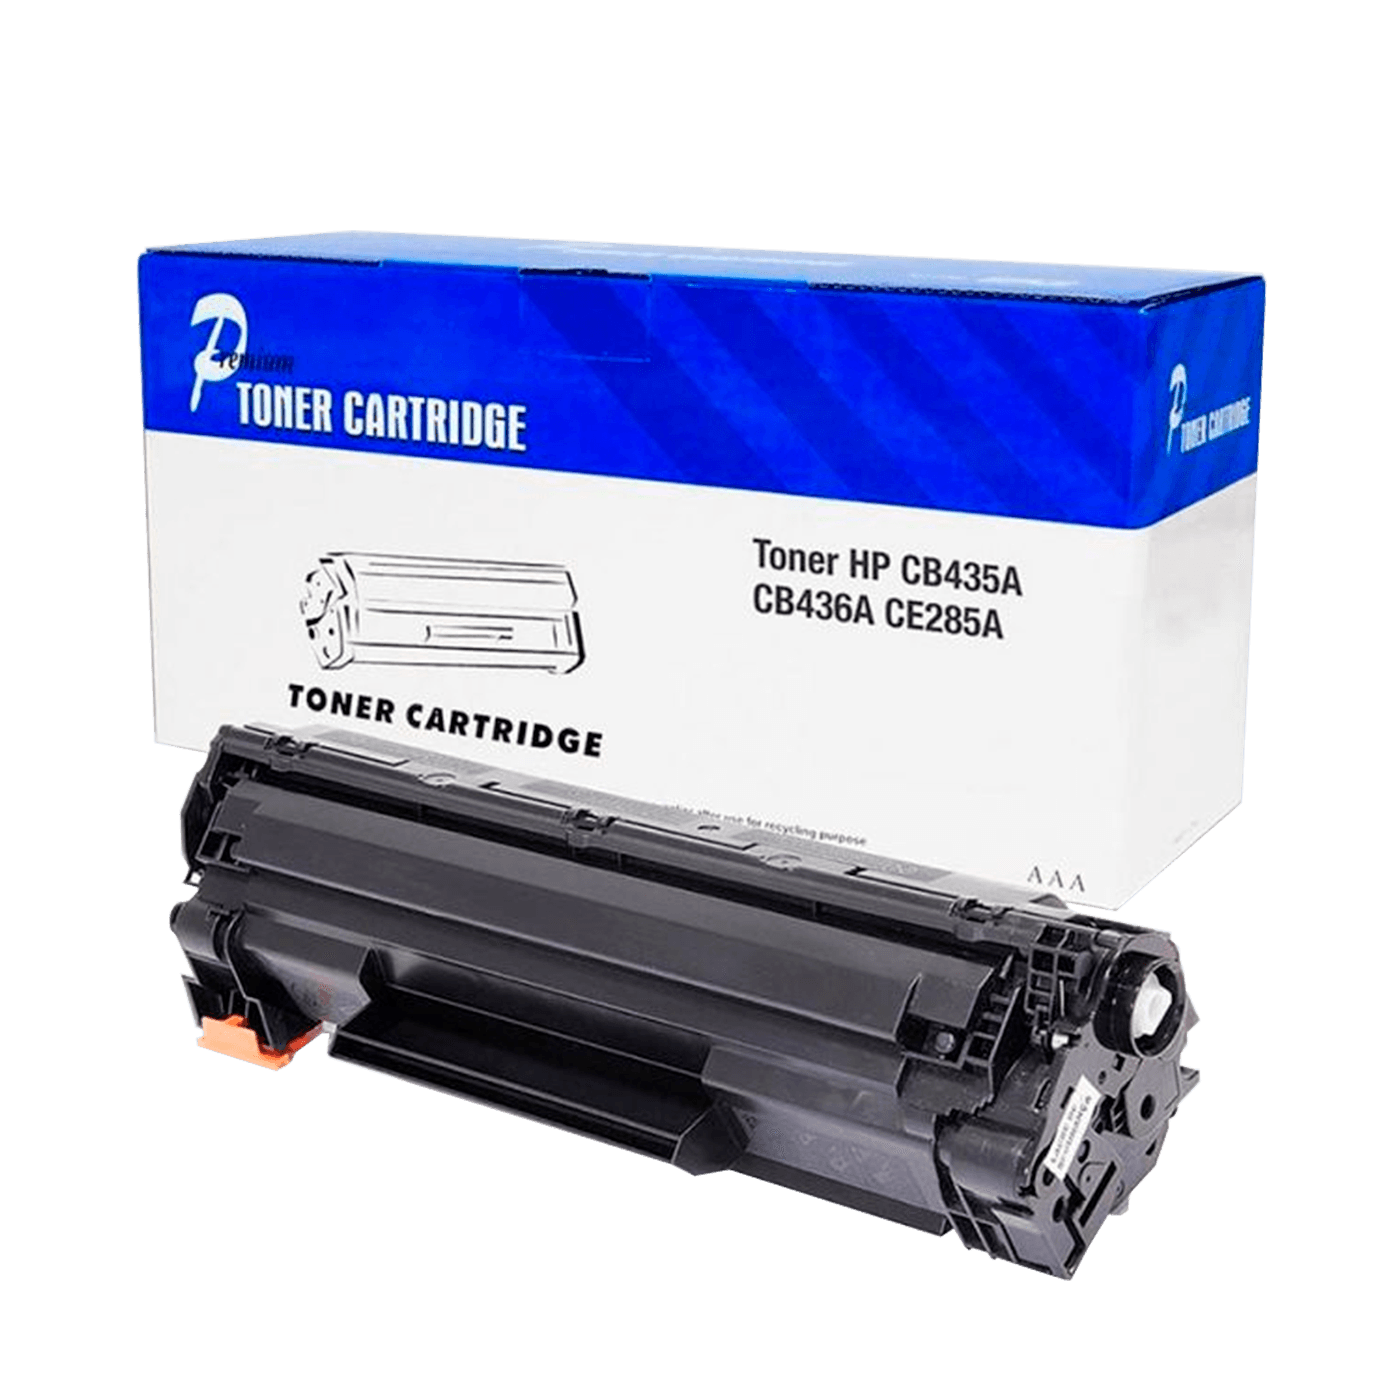 Toner HP CB435A CB436A CE285A Universal | P1102 P1005 P1505 P1006 M1132 2k